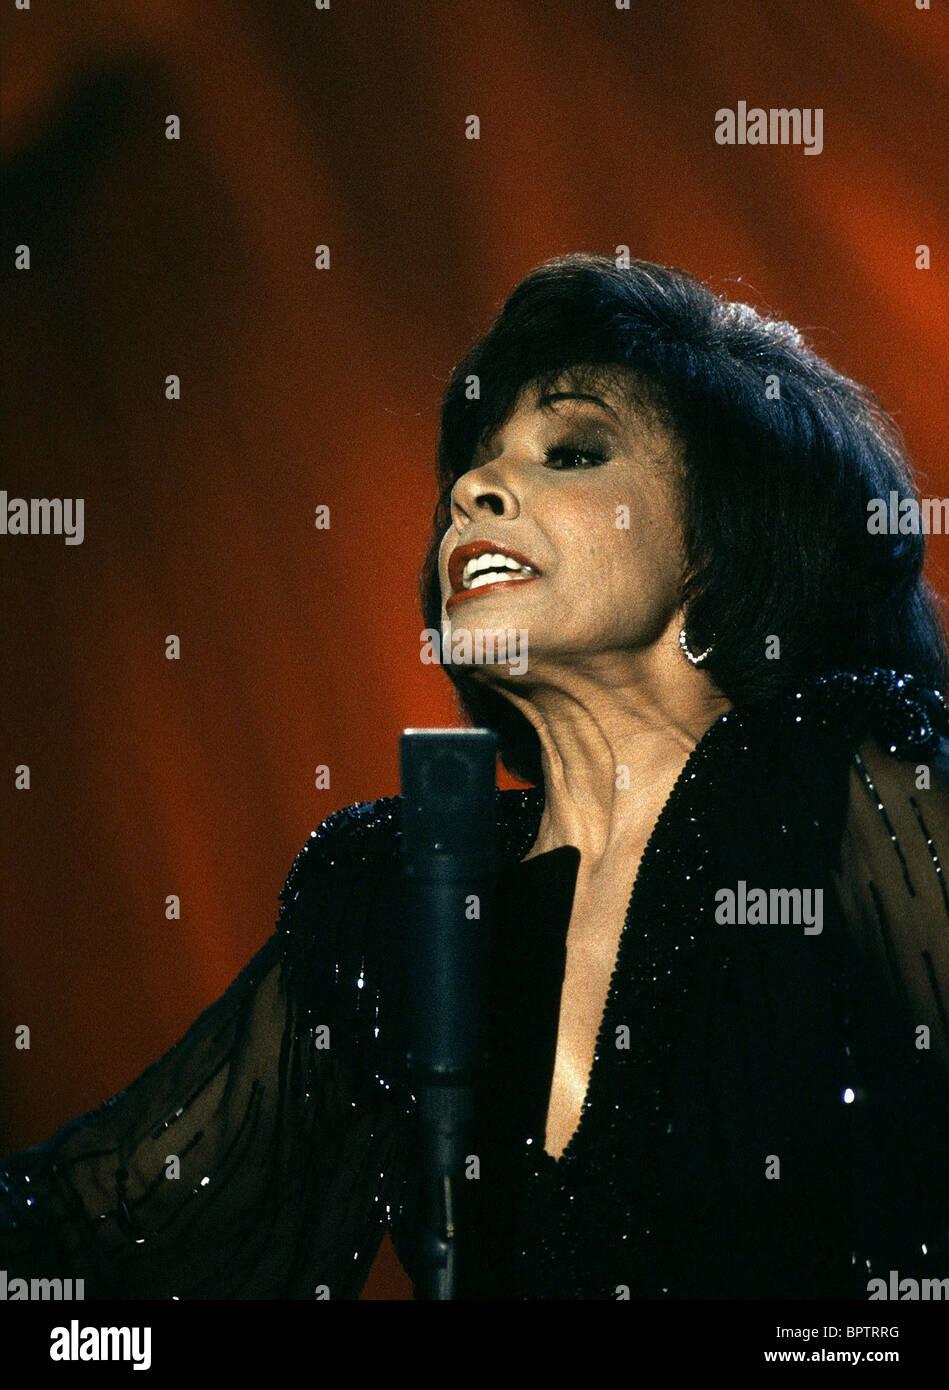 La chanteuse Shirley Bassey (1985) Photo Stock